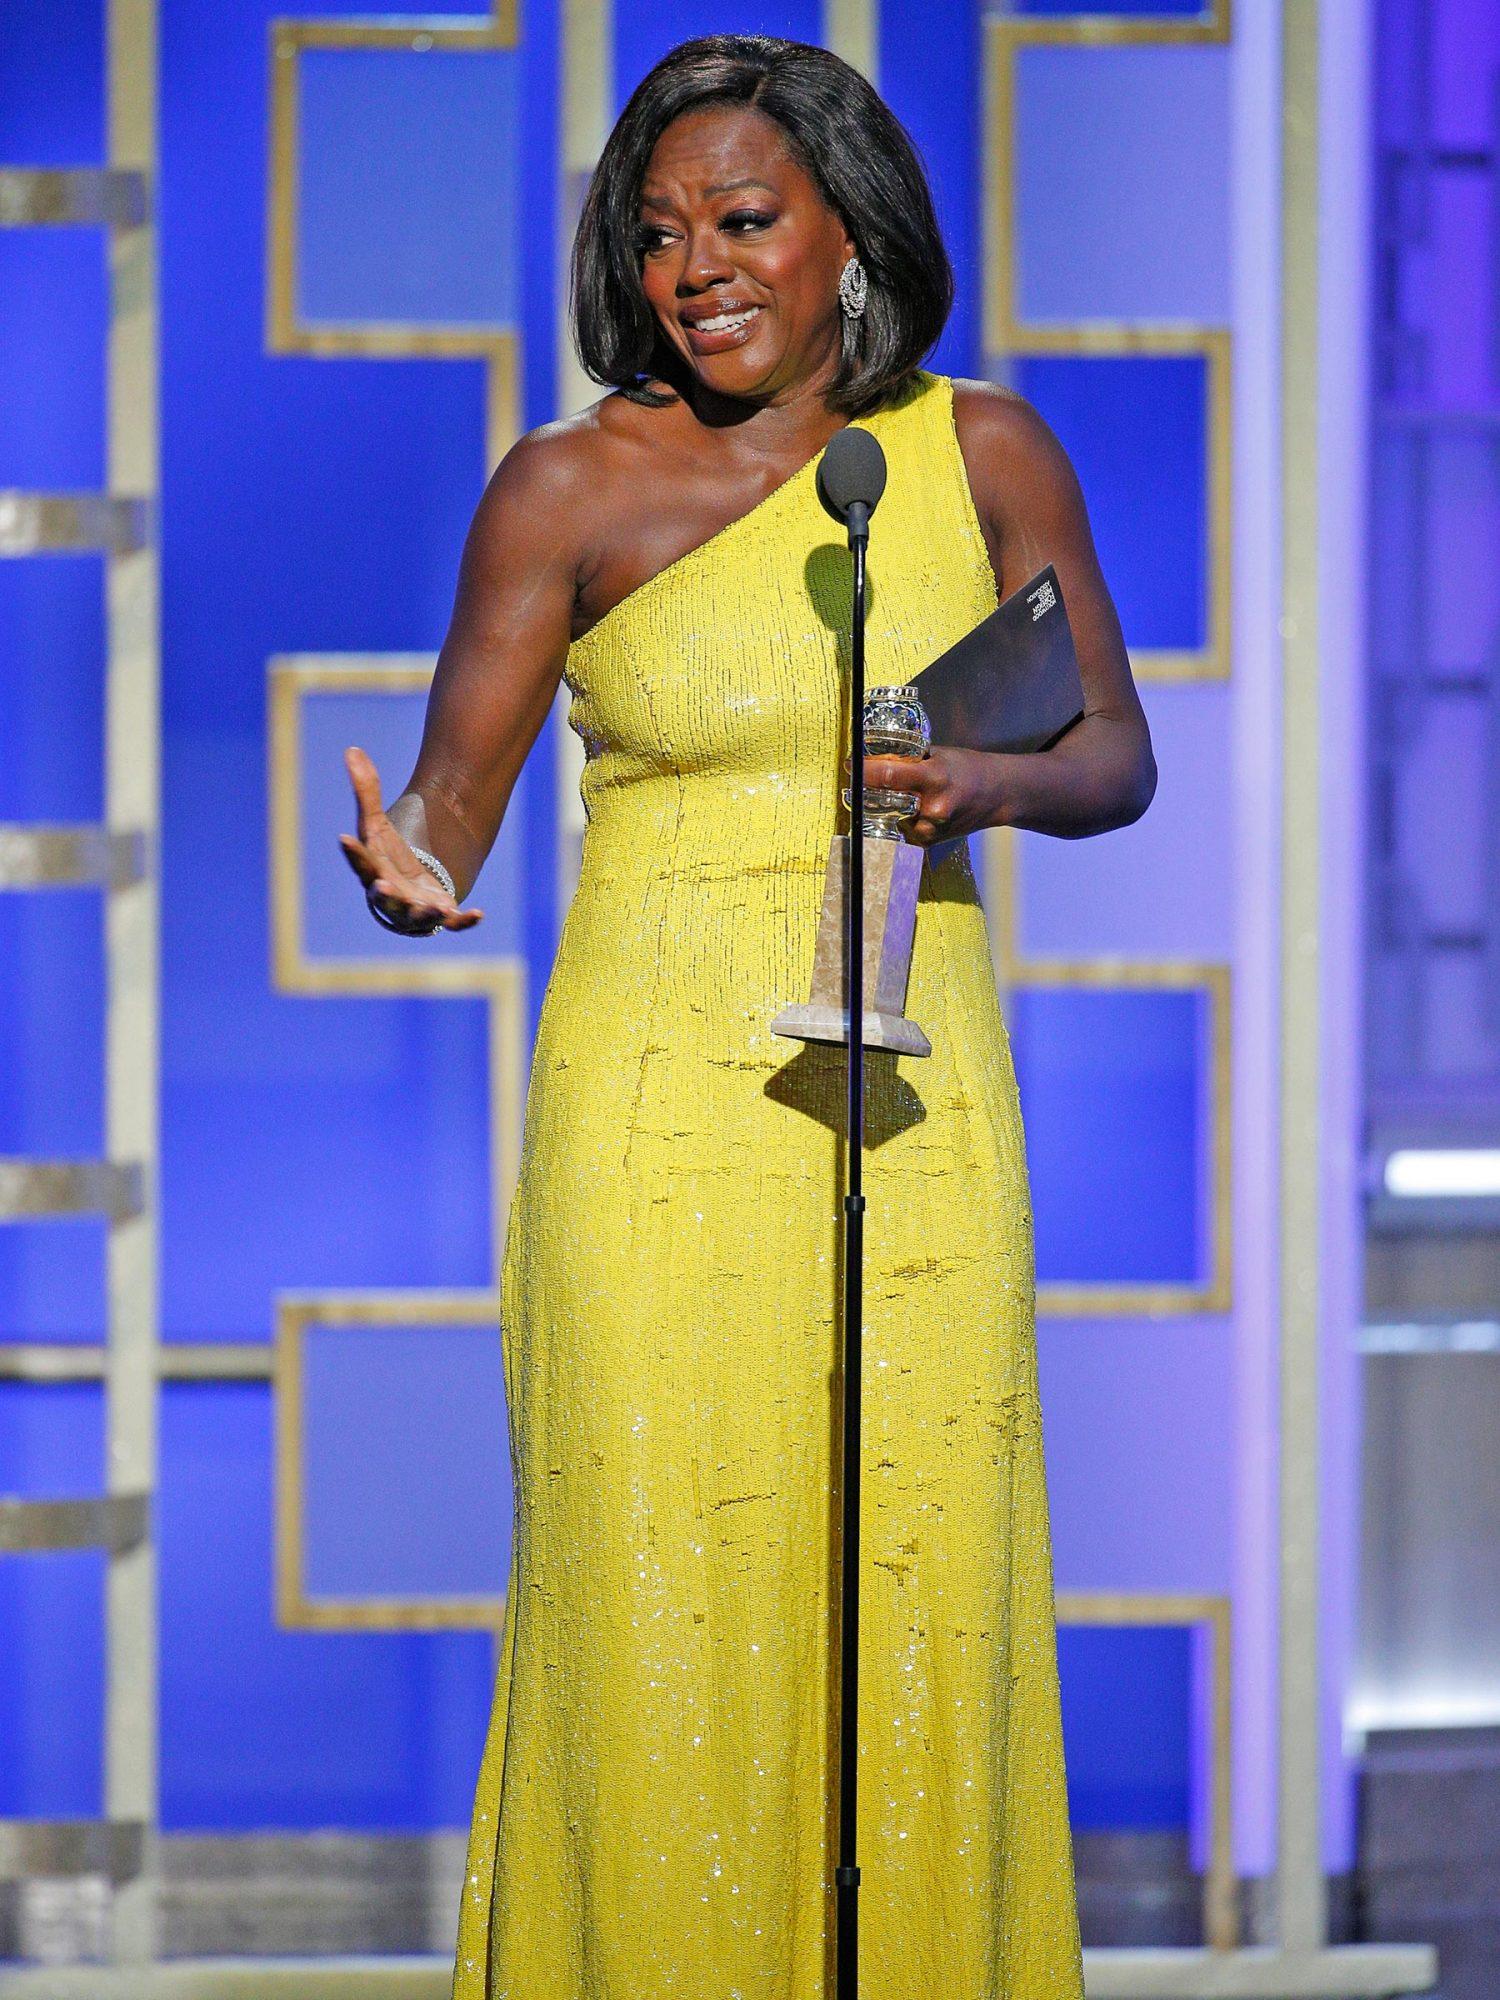 APTOPIX The 74th Annual Golden Globe Awards - Show